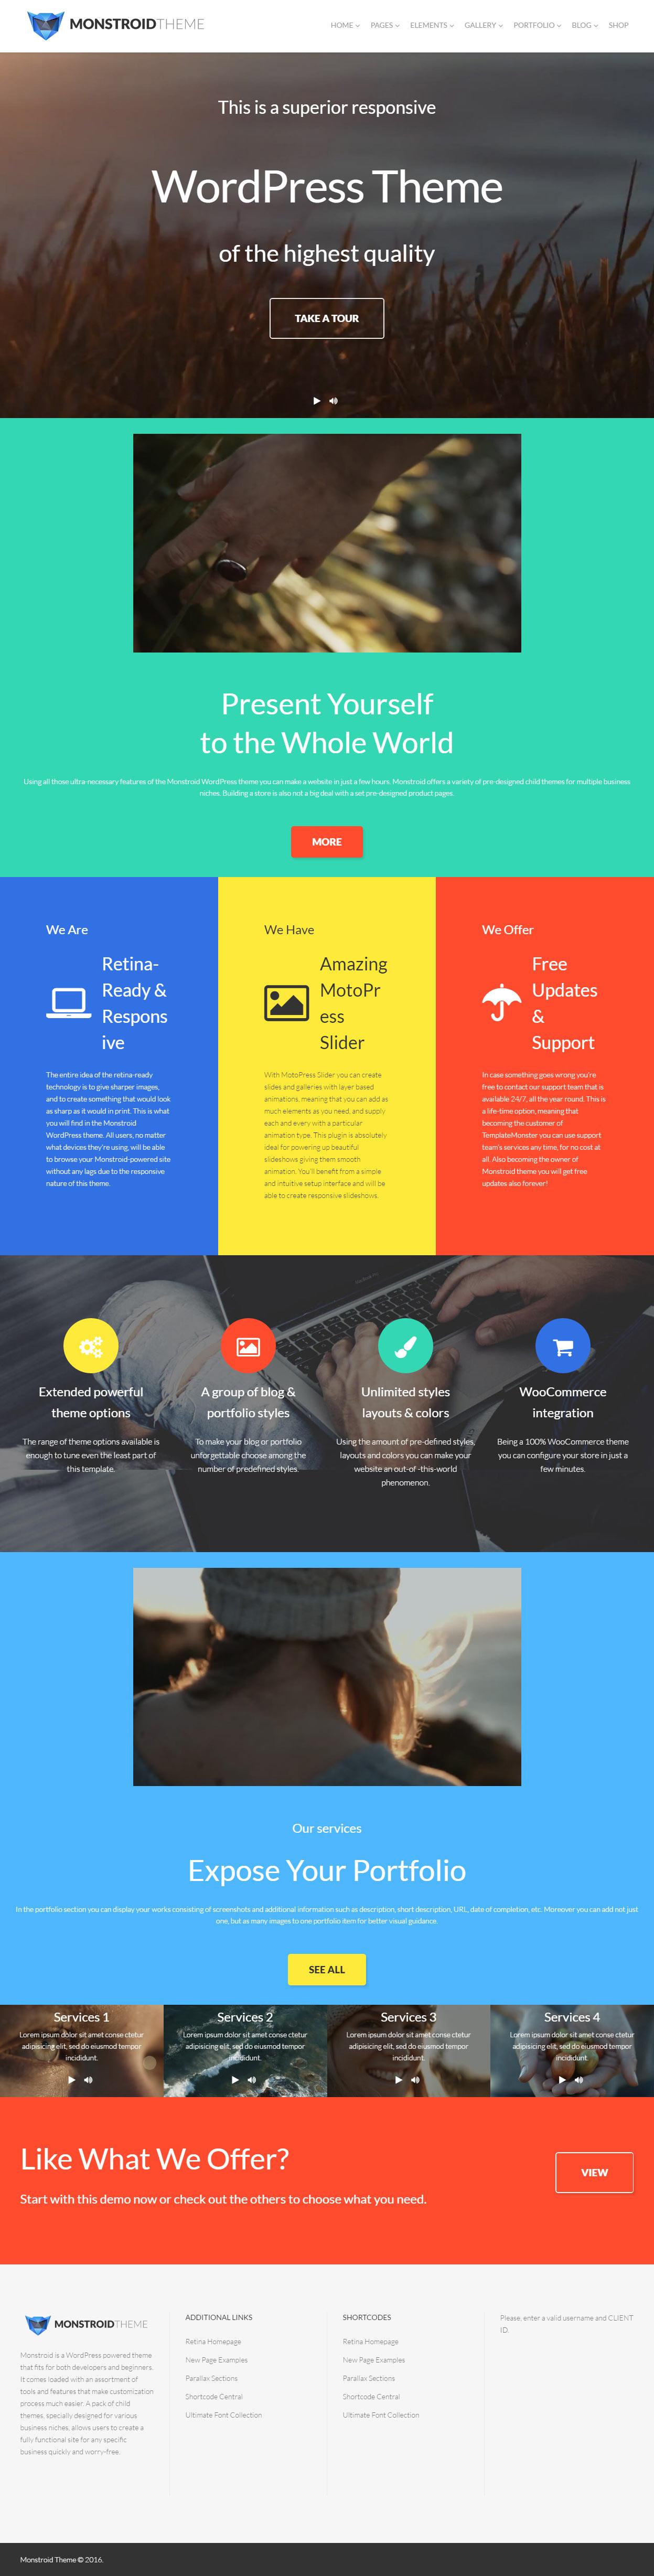 ... Best Responsive Full Screen Video Background WordPress Themes 2017 7